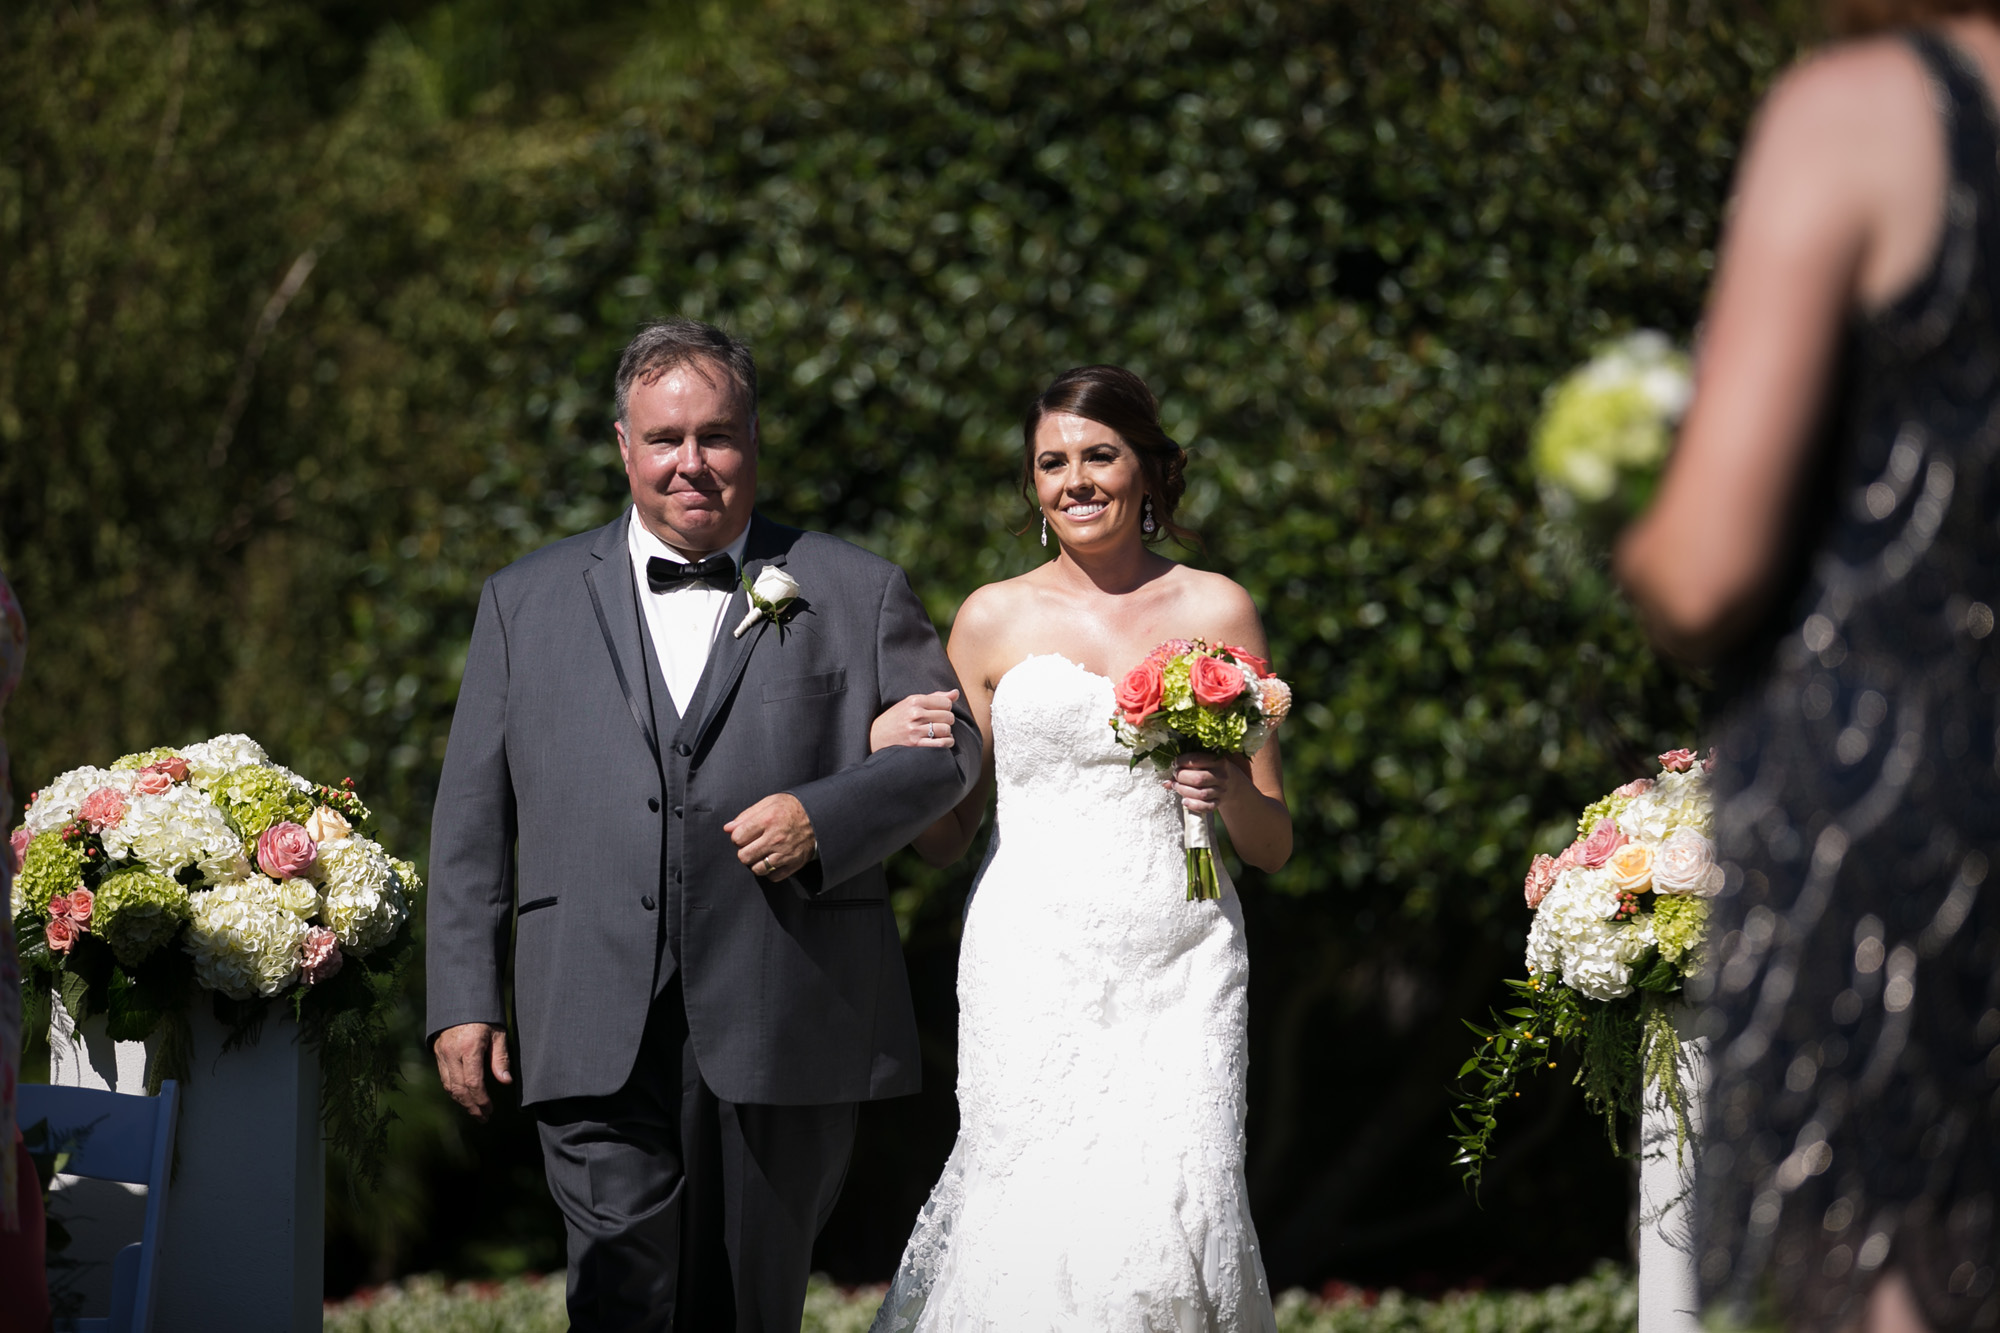 Geoff Kowalchuk BM Wedding Photography-014.jpg